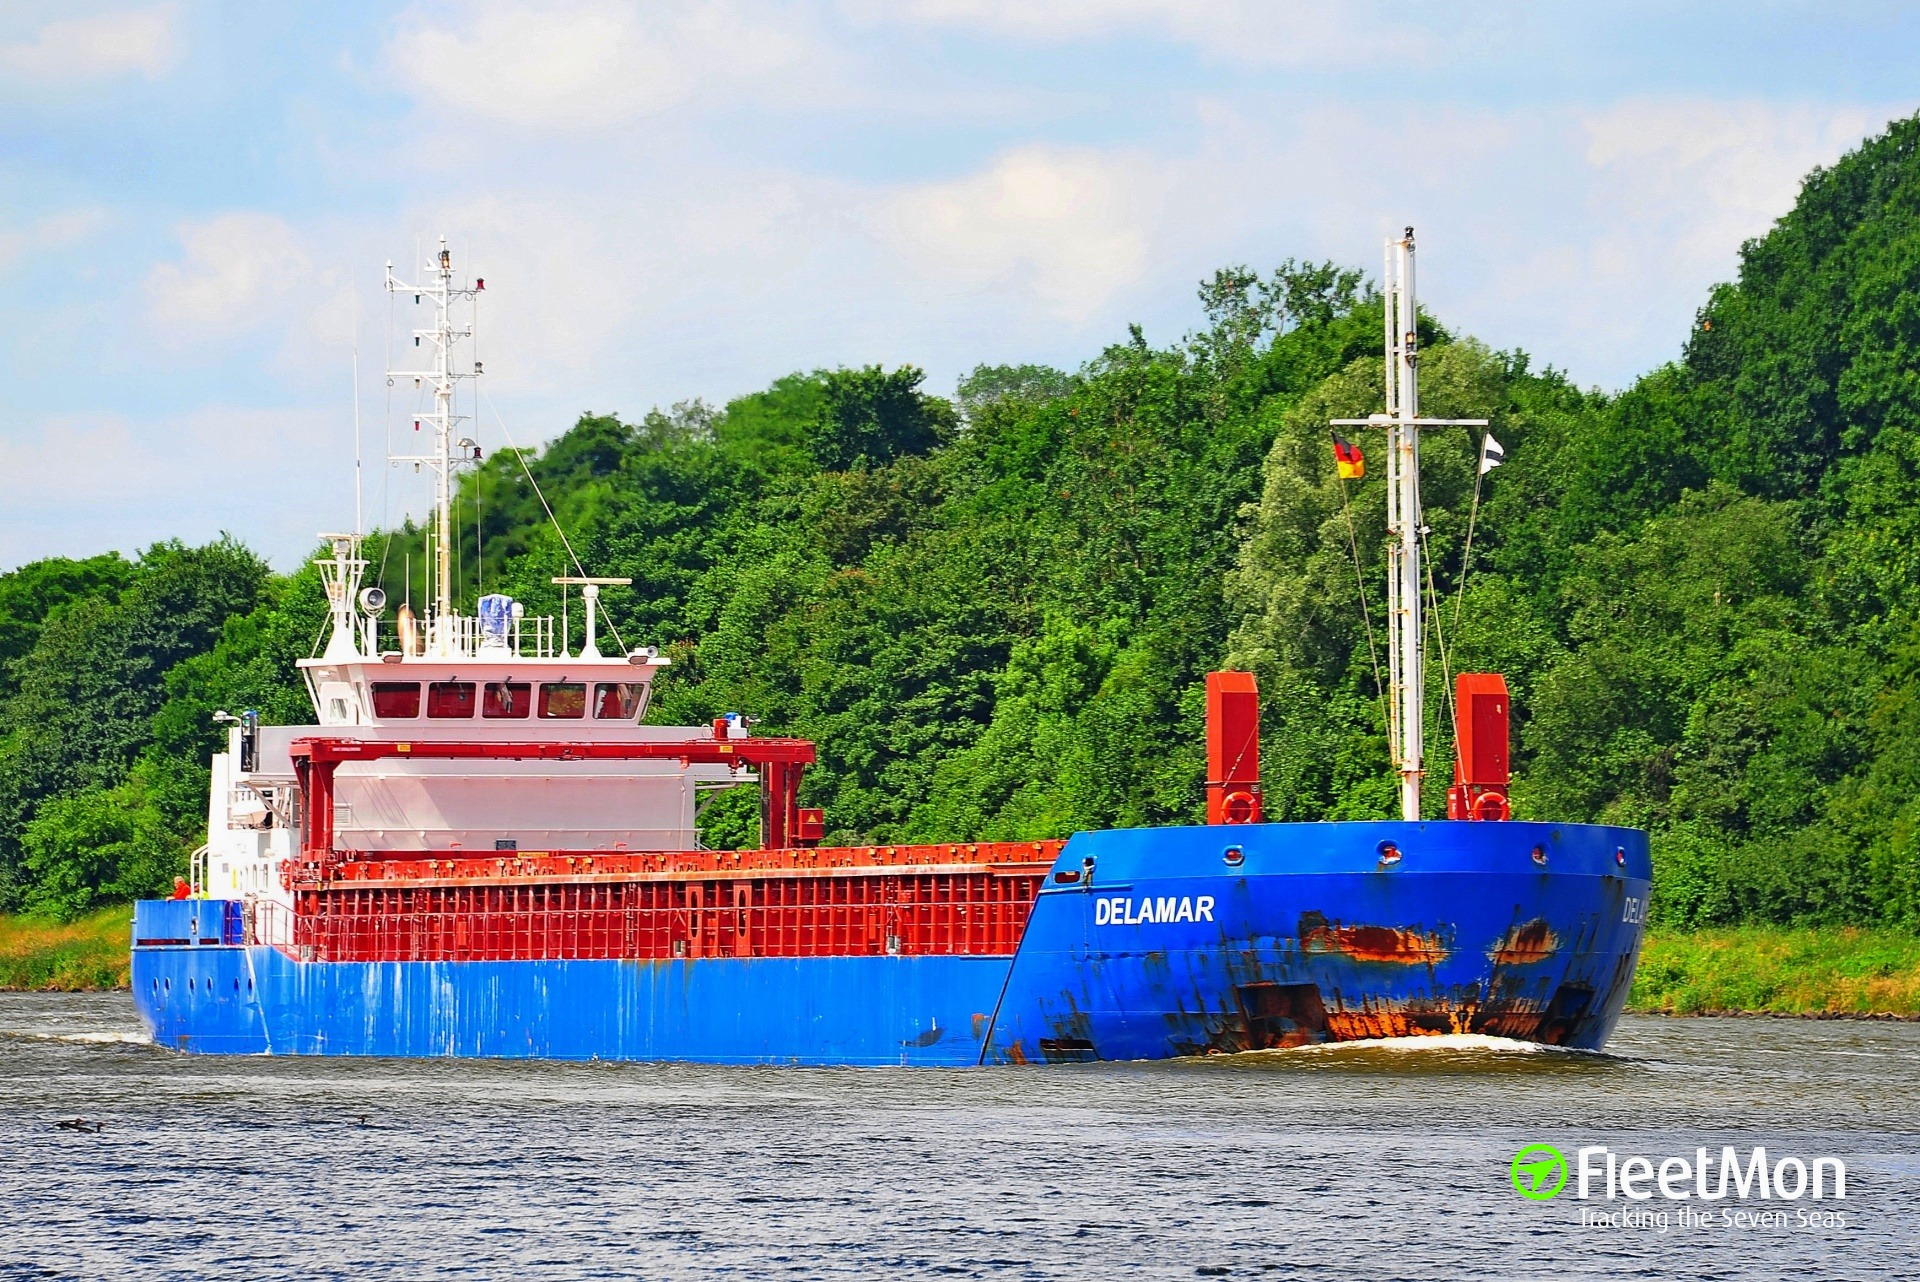 DELAMAR disabled entering Kiel Canal